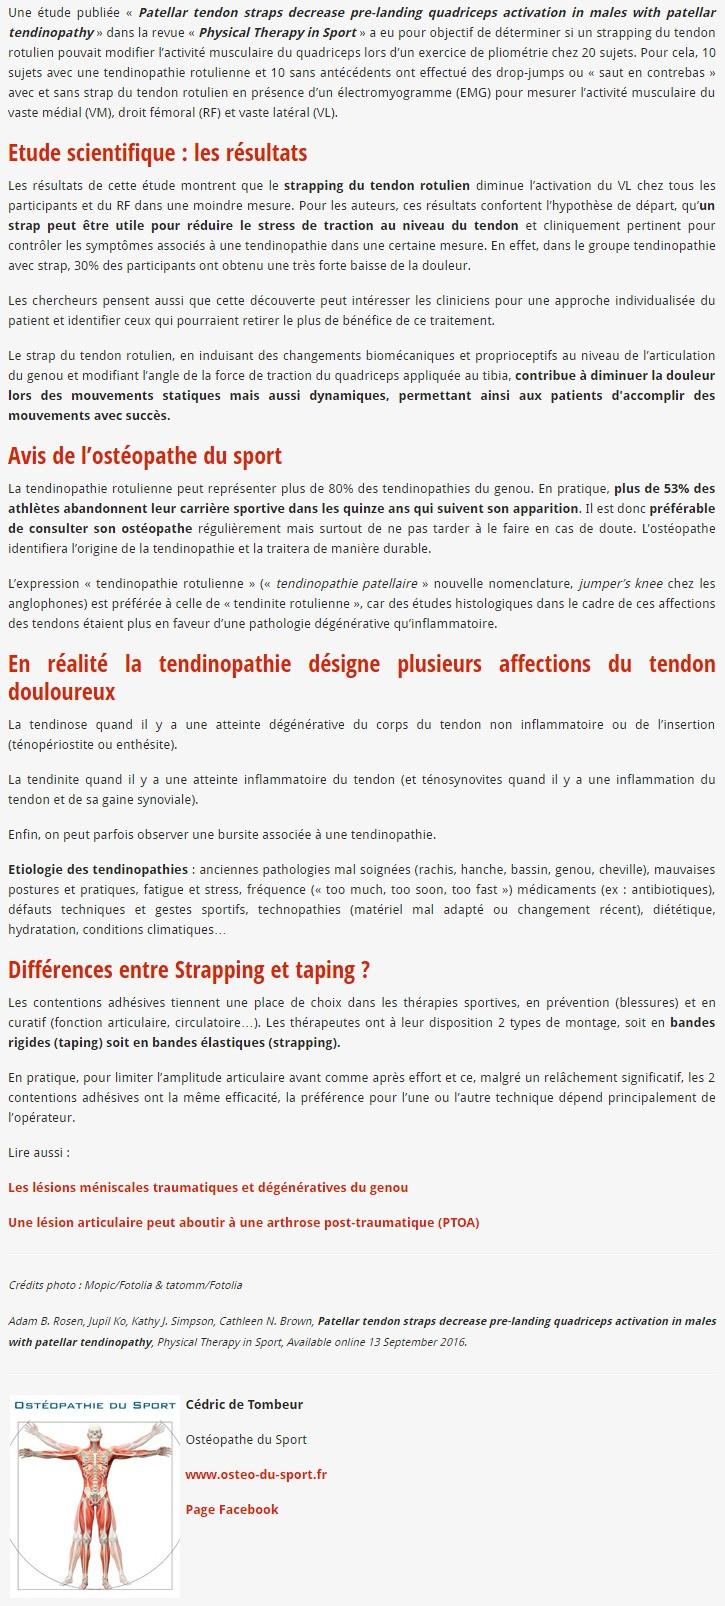 Tendinite, tendinopathie  du genou - Ostéopathe du sport Saint-Nazaire